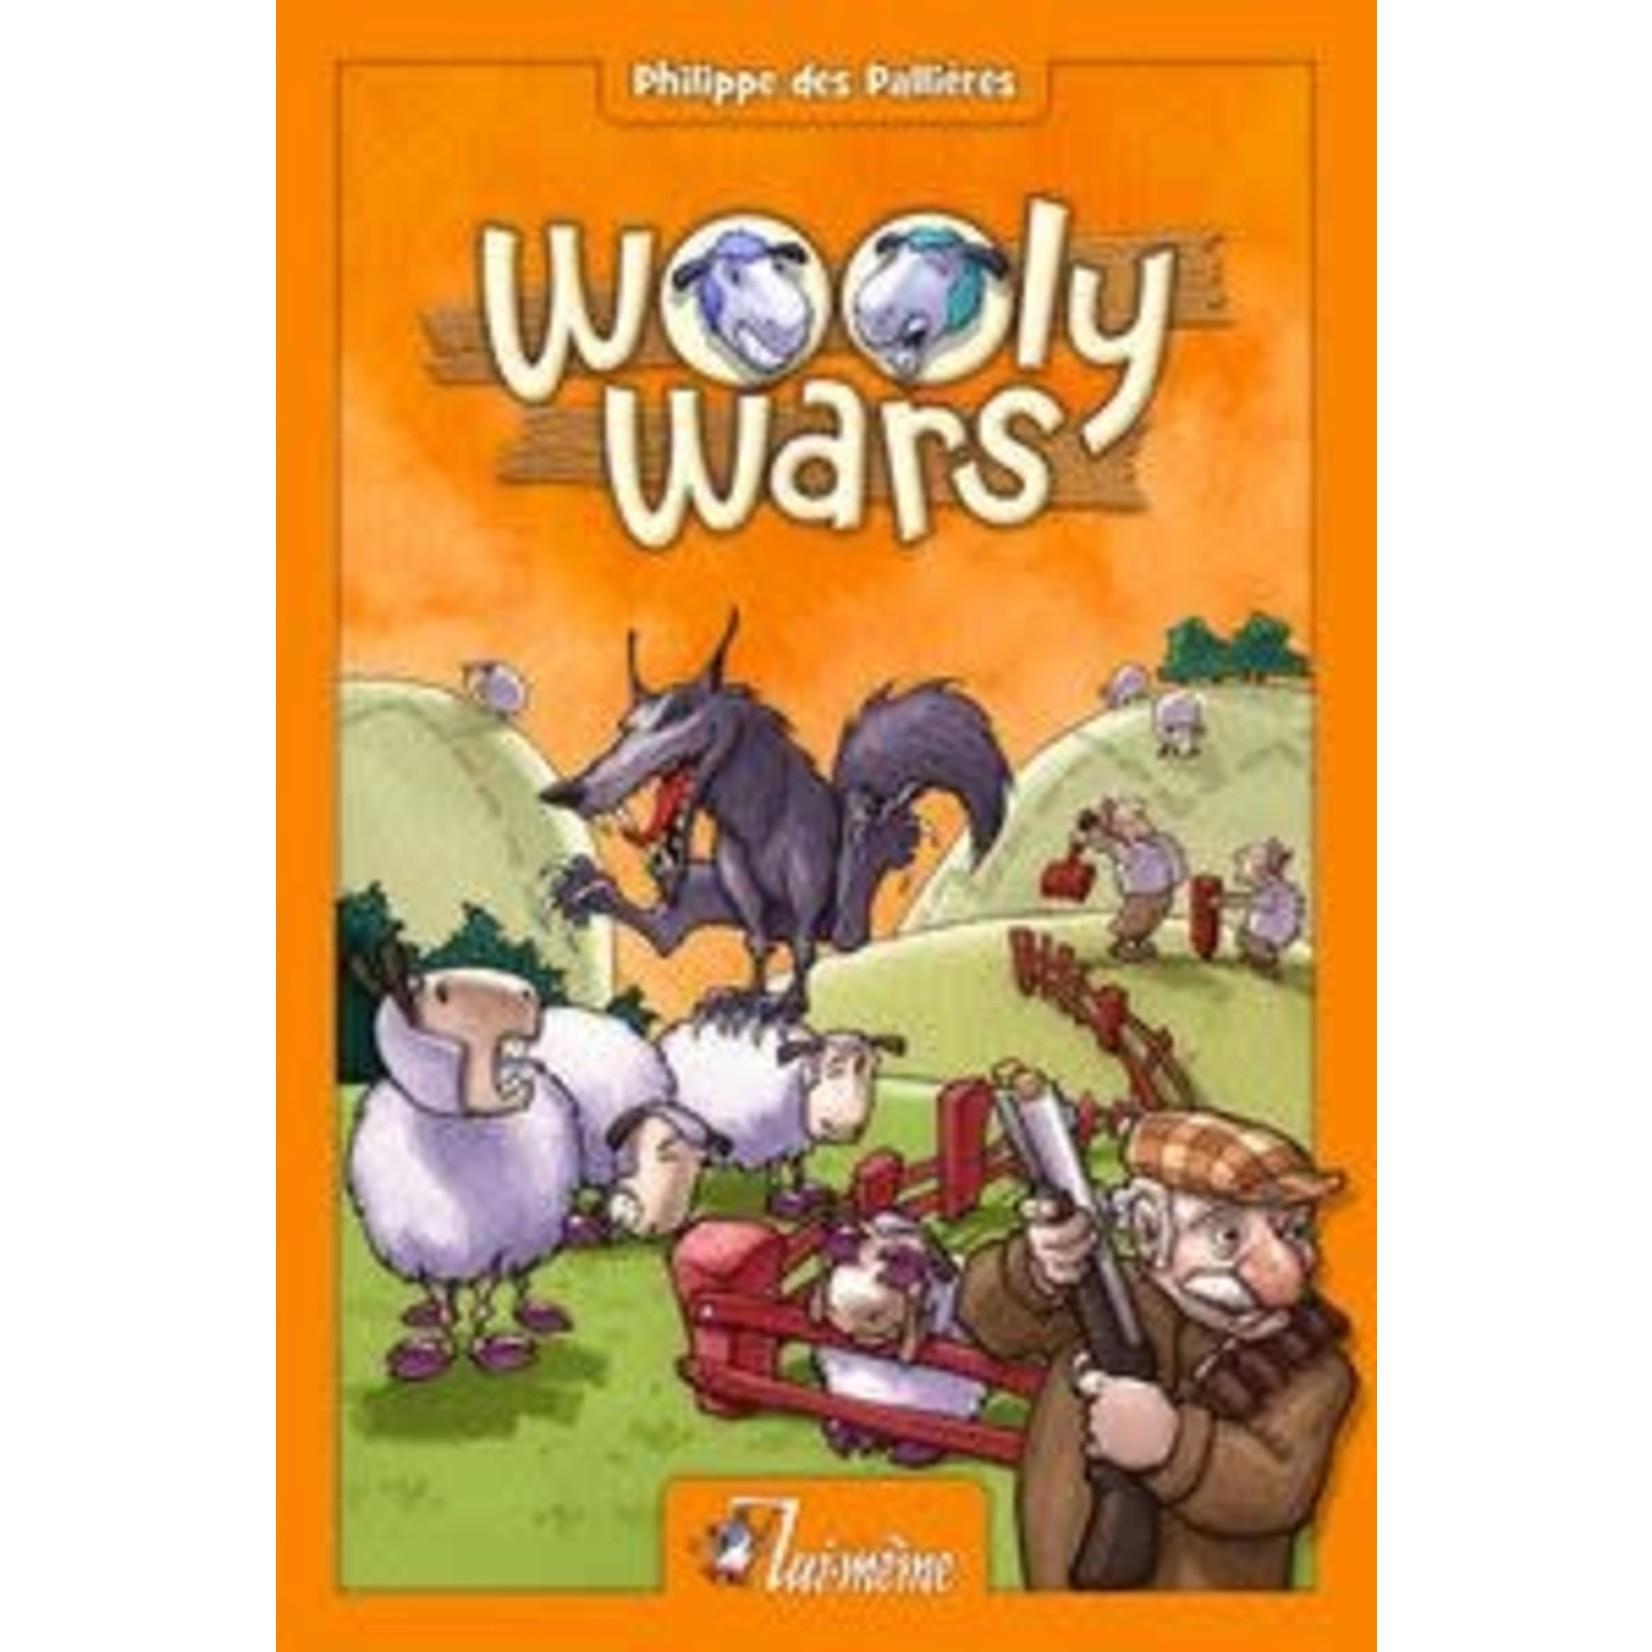 Wooly Wars Board Game